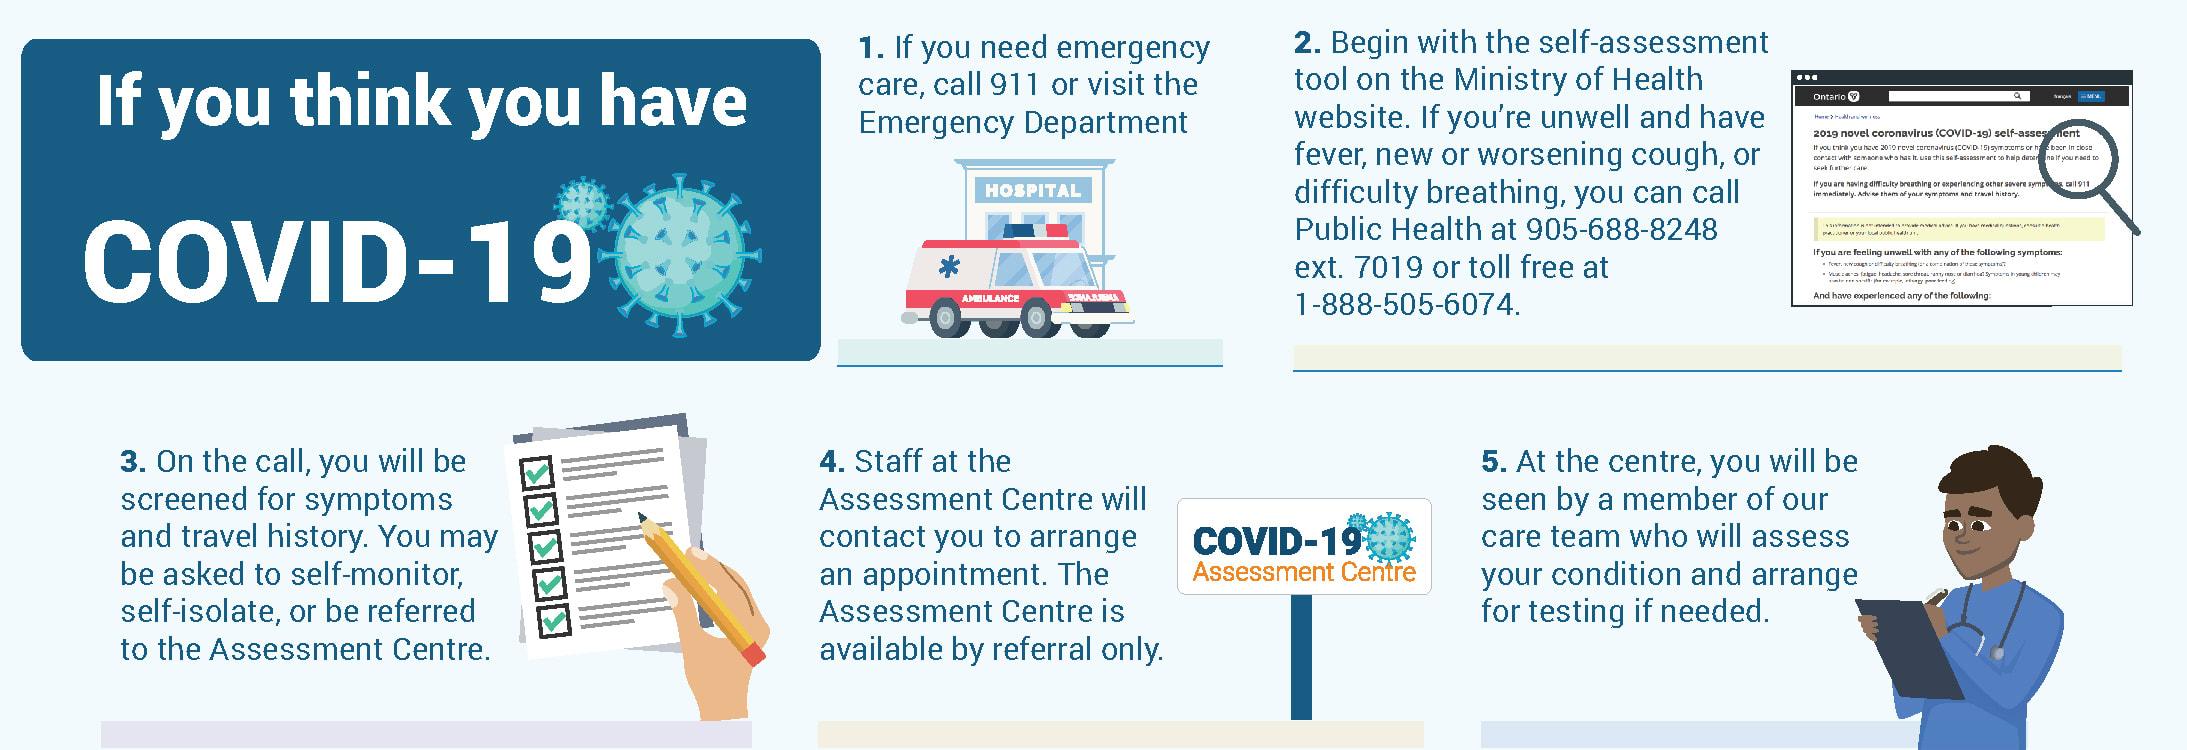 Niagara Health opens COVID-19 assessment centre in Niagara Falls ...